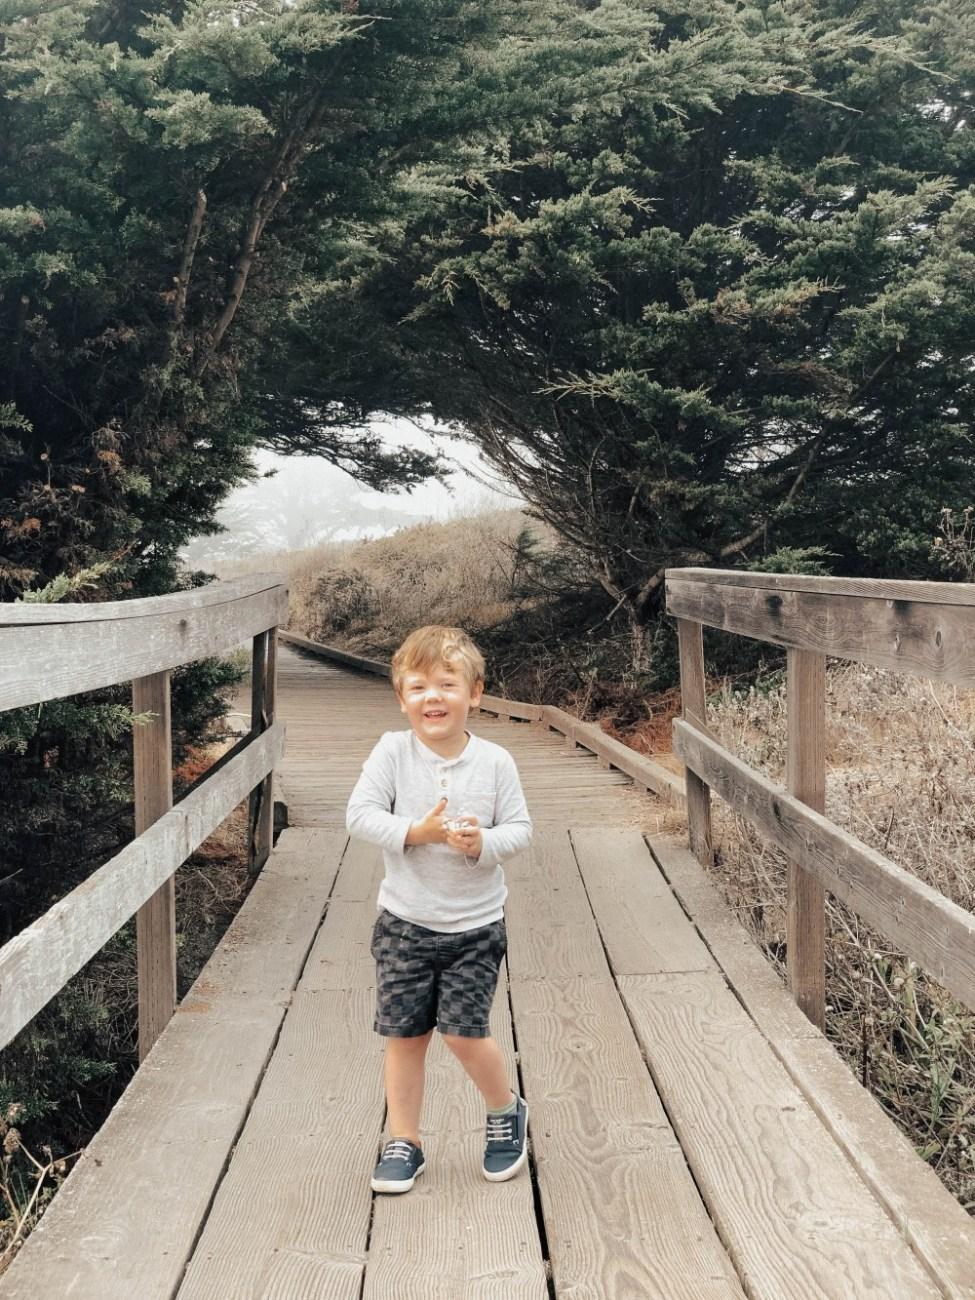 California coastal getaway to Oceanpoint Ranch in Cambria. #familytravel #covidtravel #coastalgetaway